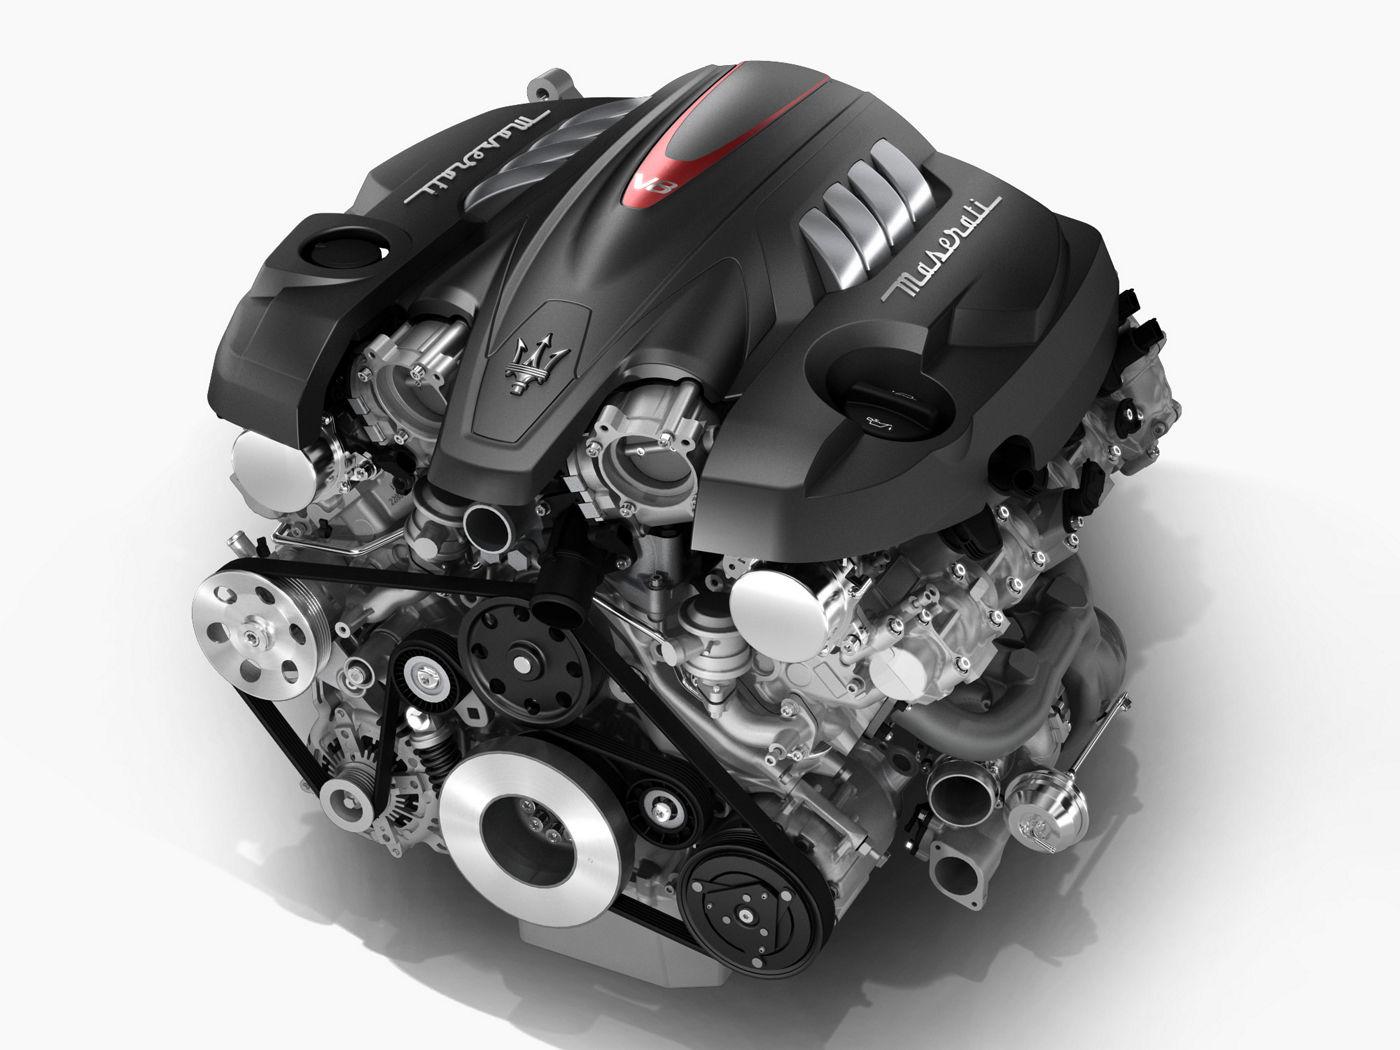 Maserati's engine - V8 engine structure for Quattroporte GTS